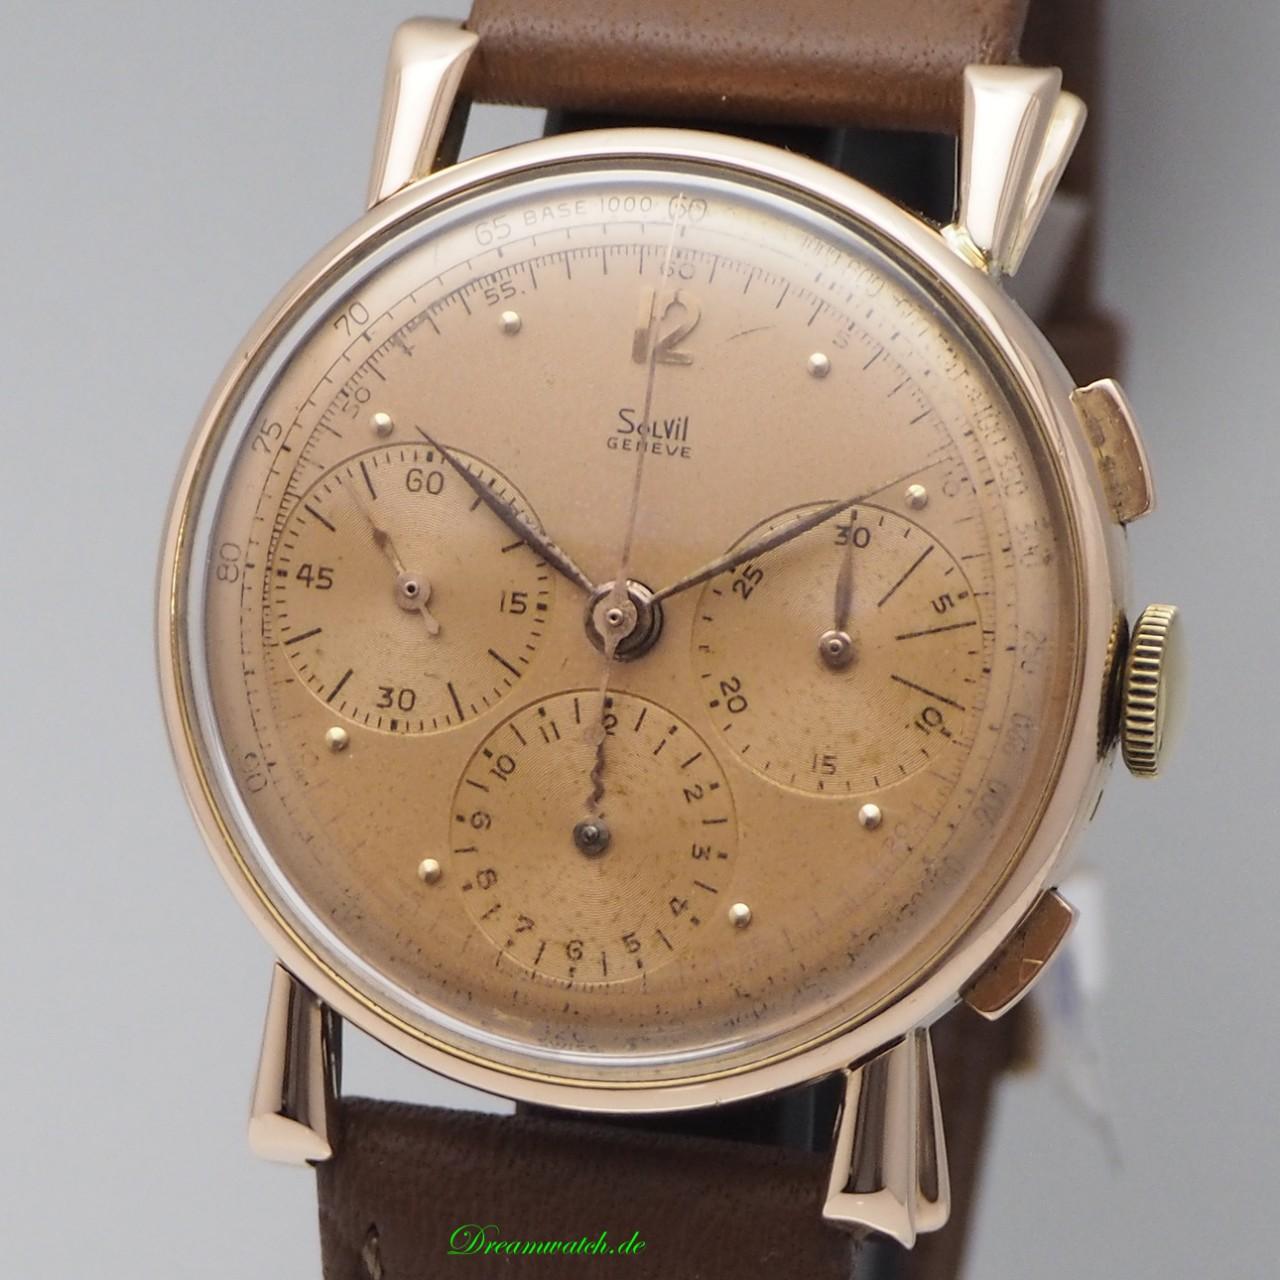 Vintage Solvil Chronograph Valjoux 72 -Rosegold 18k/750